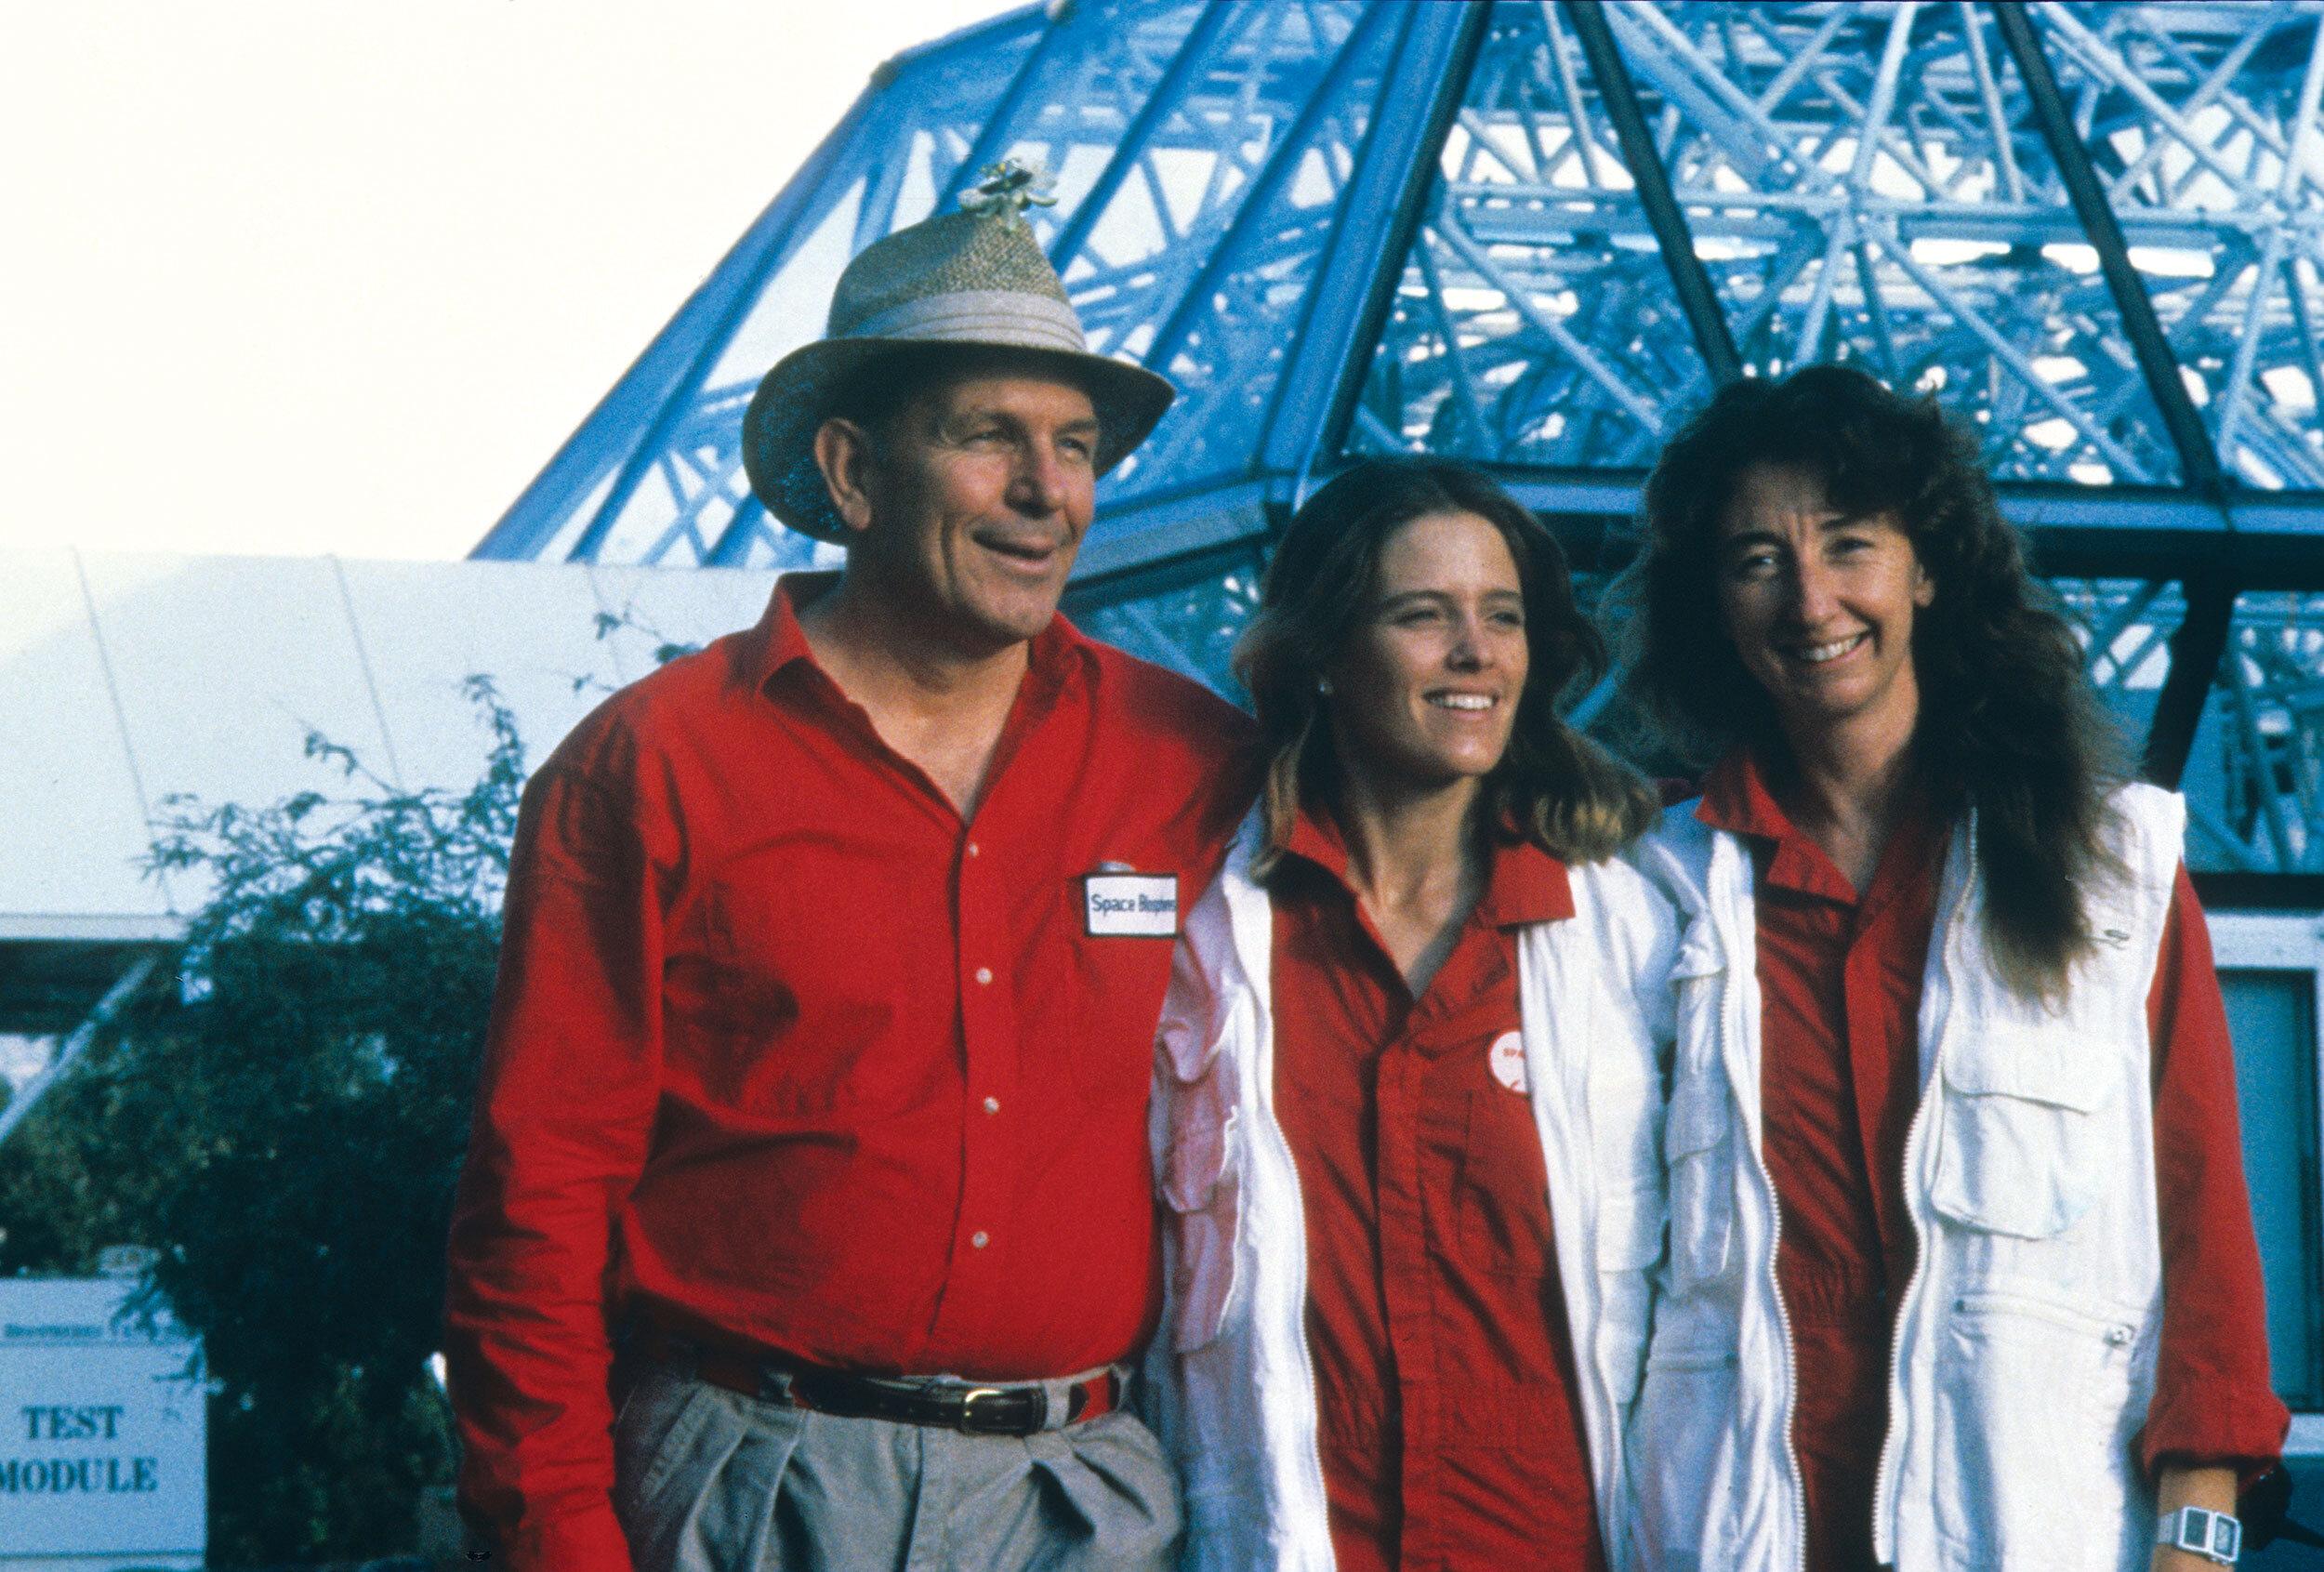 John Allen with biospherians Abigail Allay and Linda Leigh